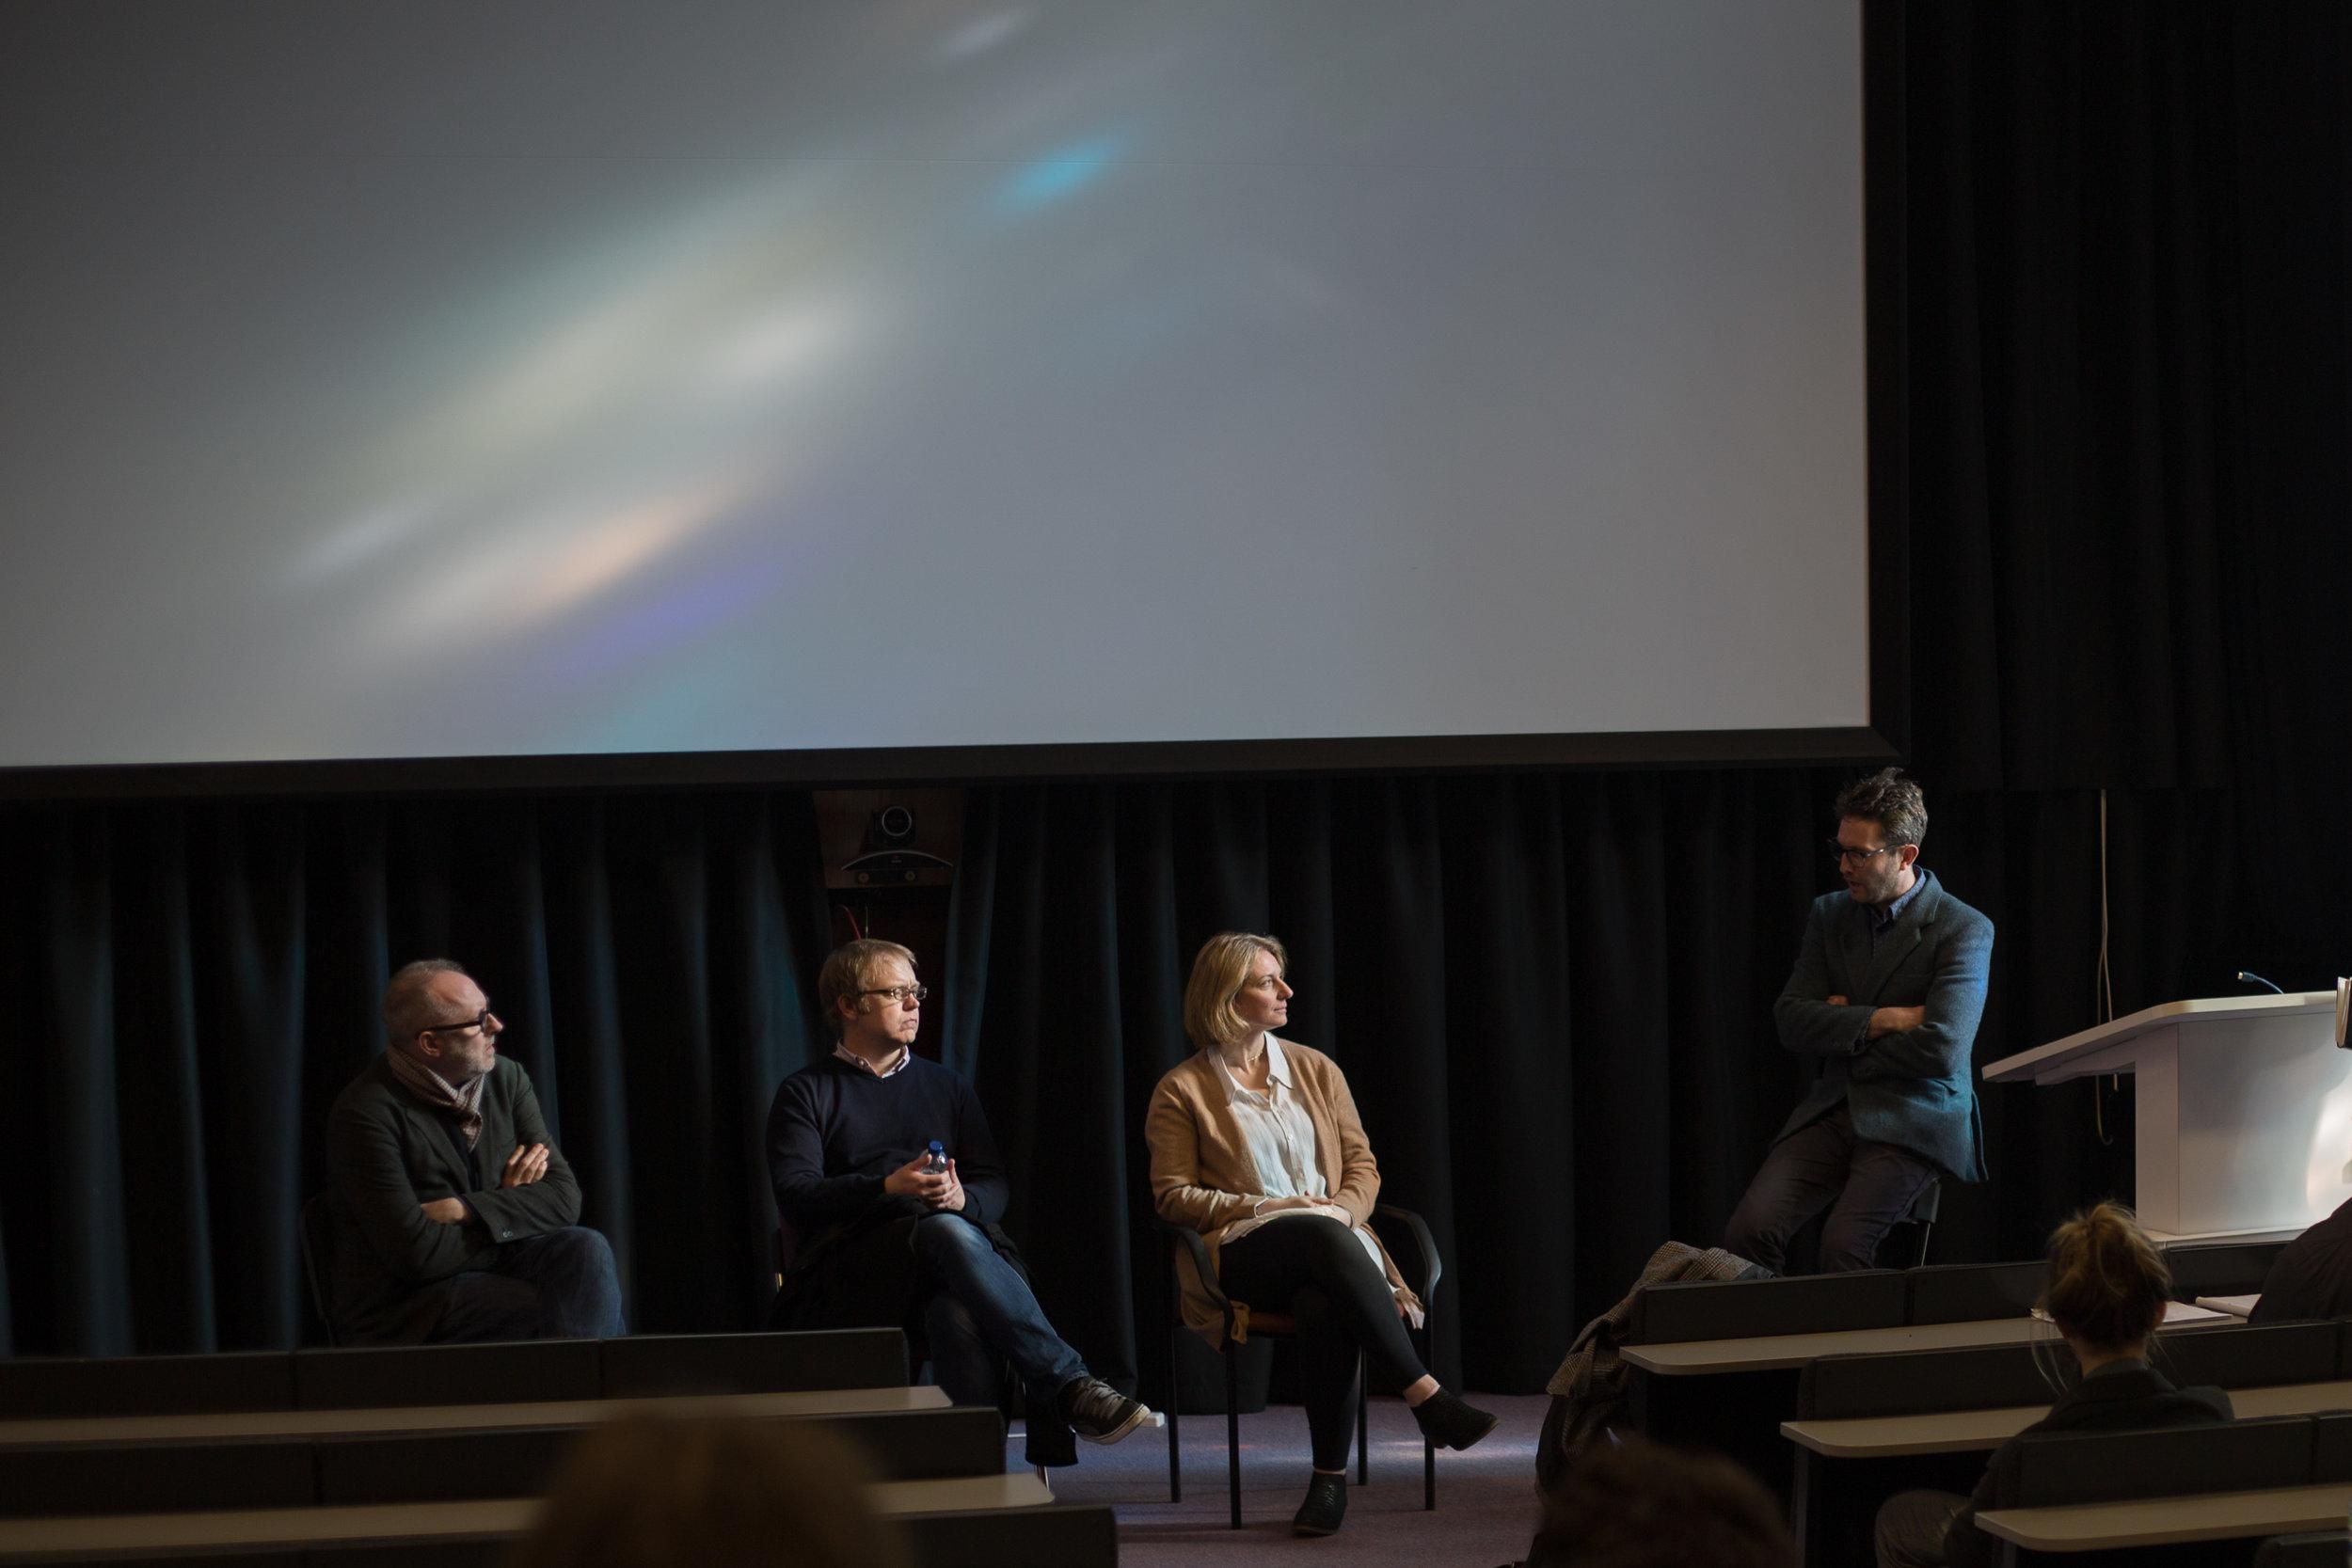 IoP Symposium, Plenary, 21 Feb 2018